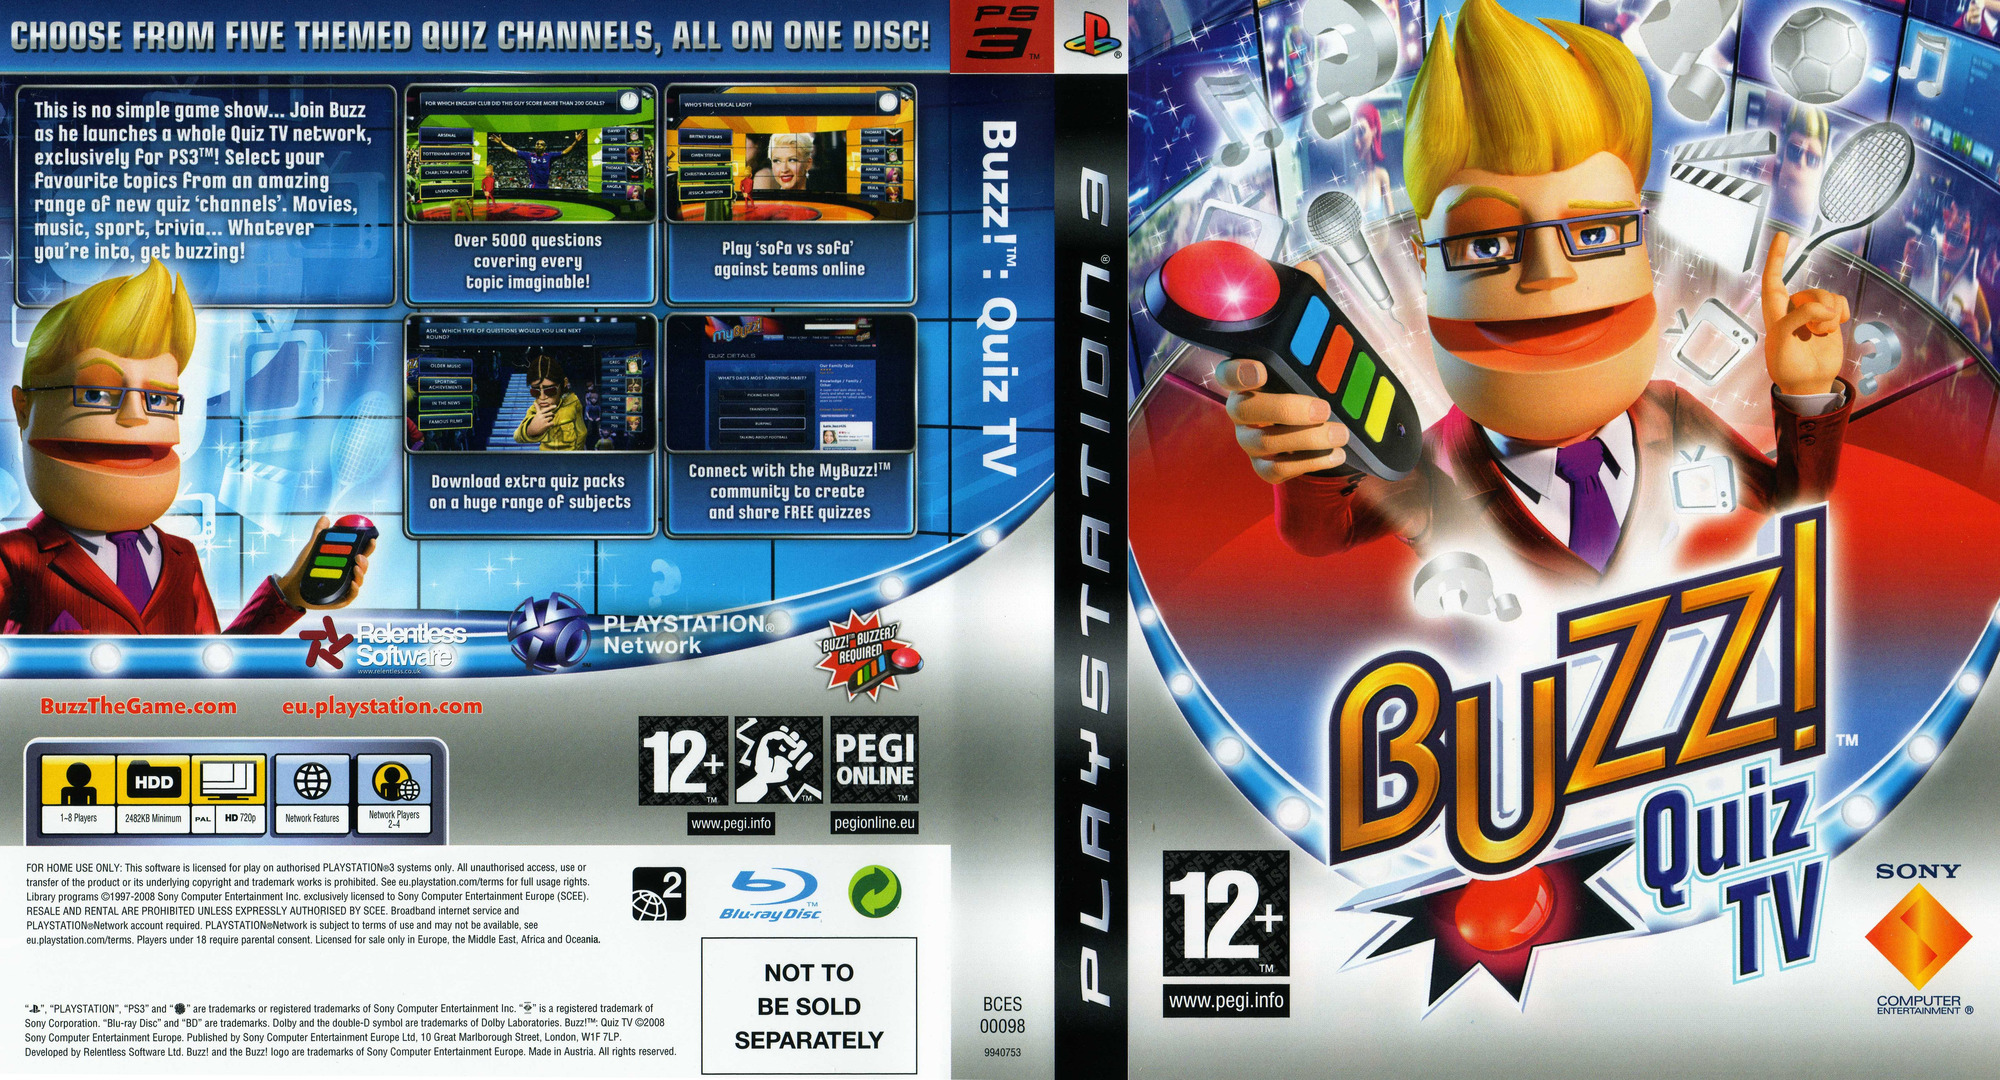 Buzz! Quiz TV PS3 coverfullHQ (BCES00098)